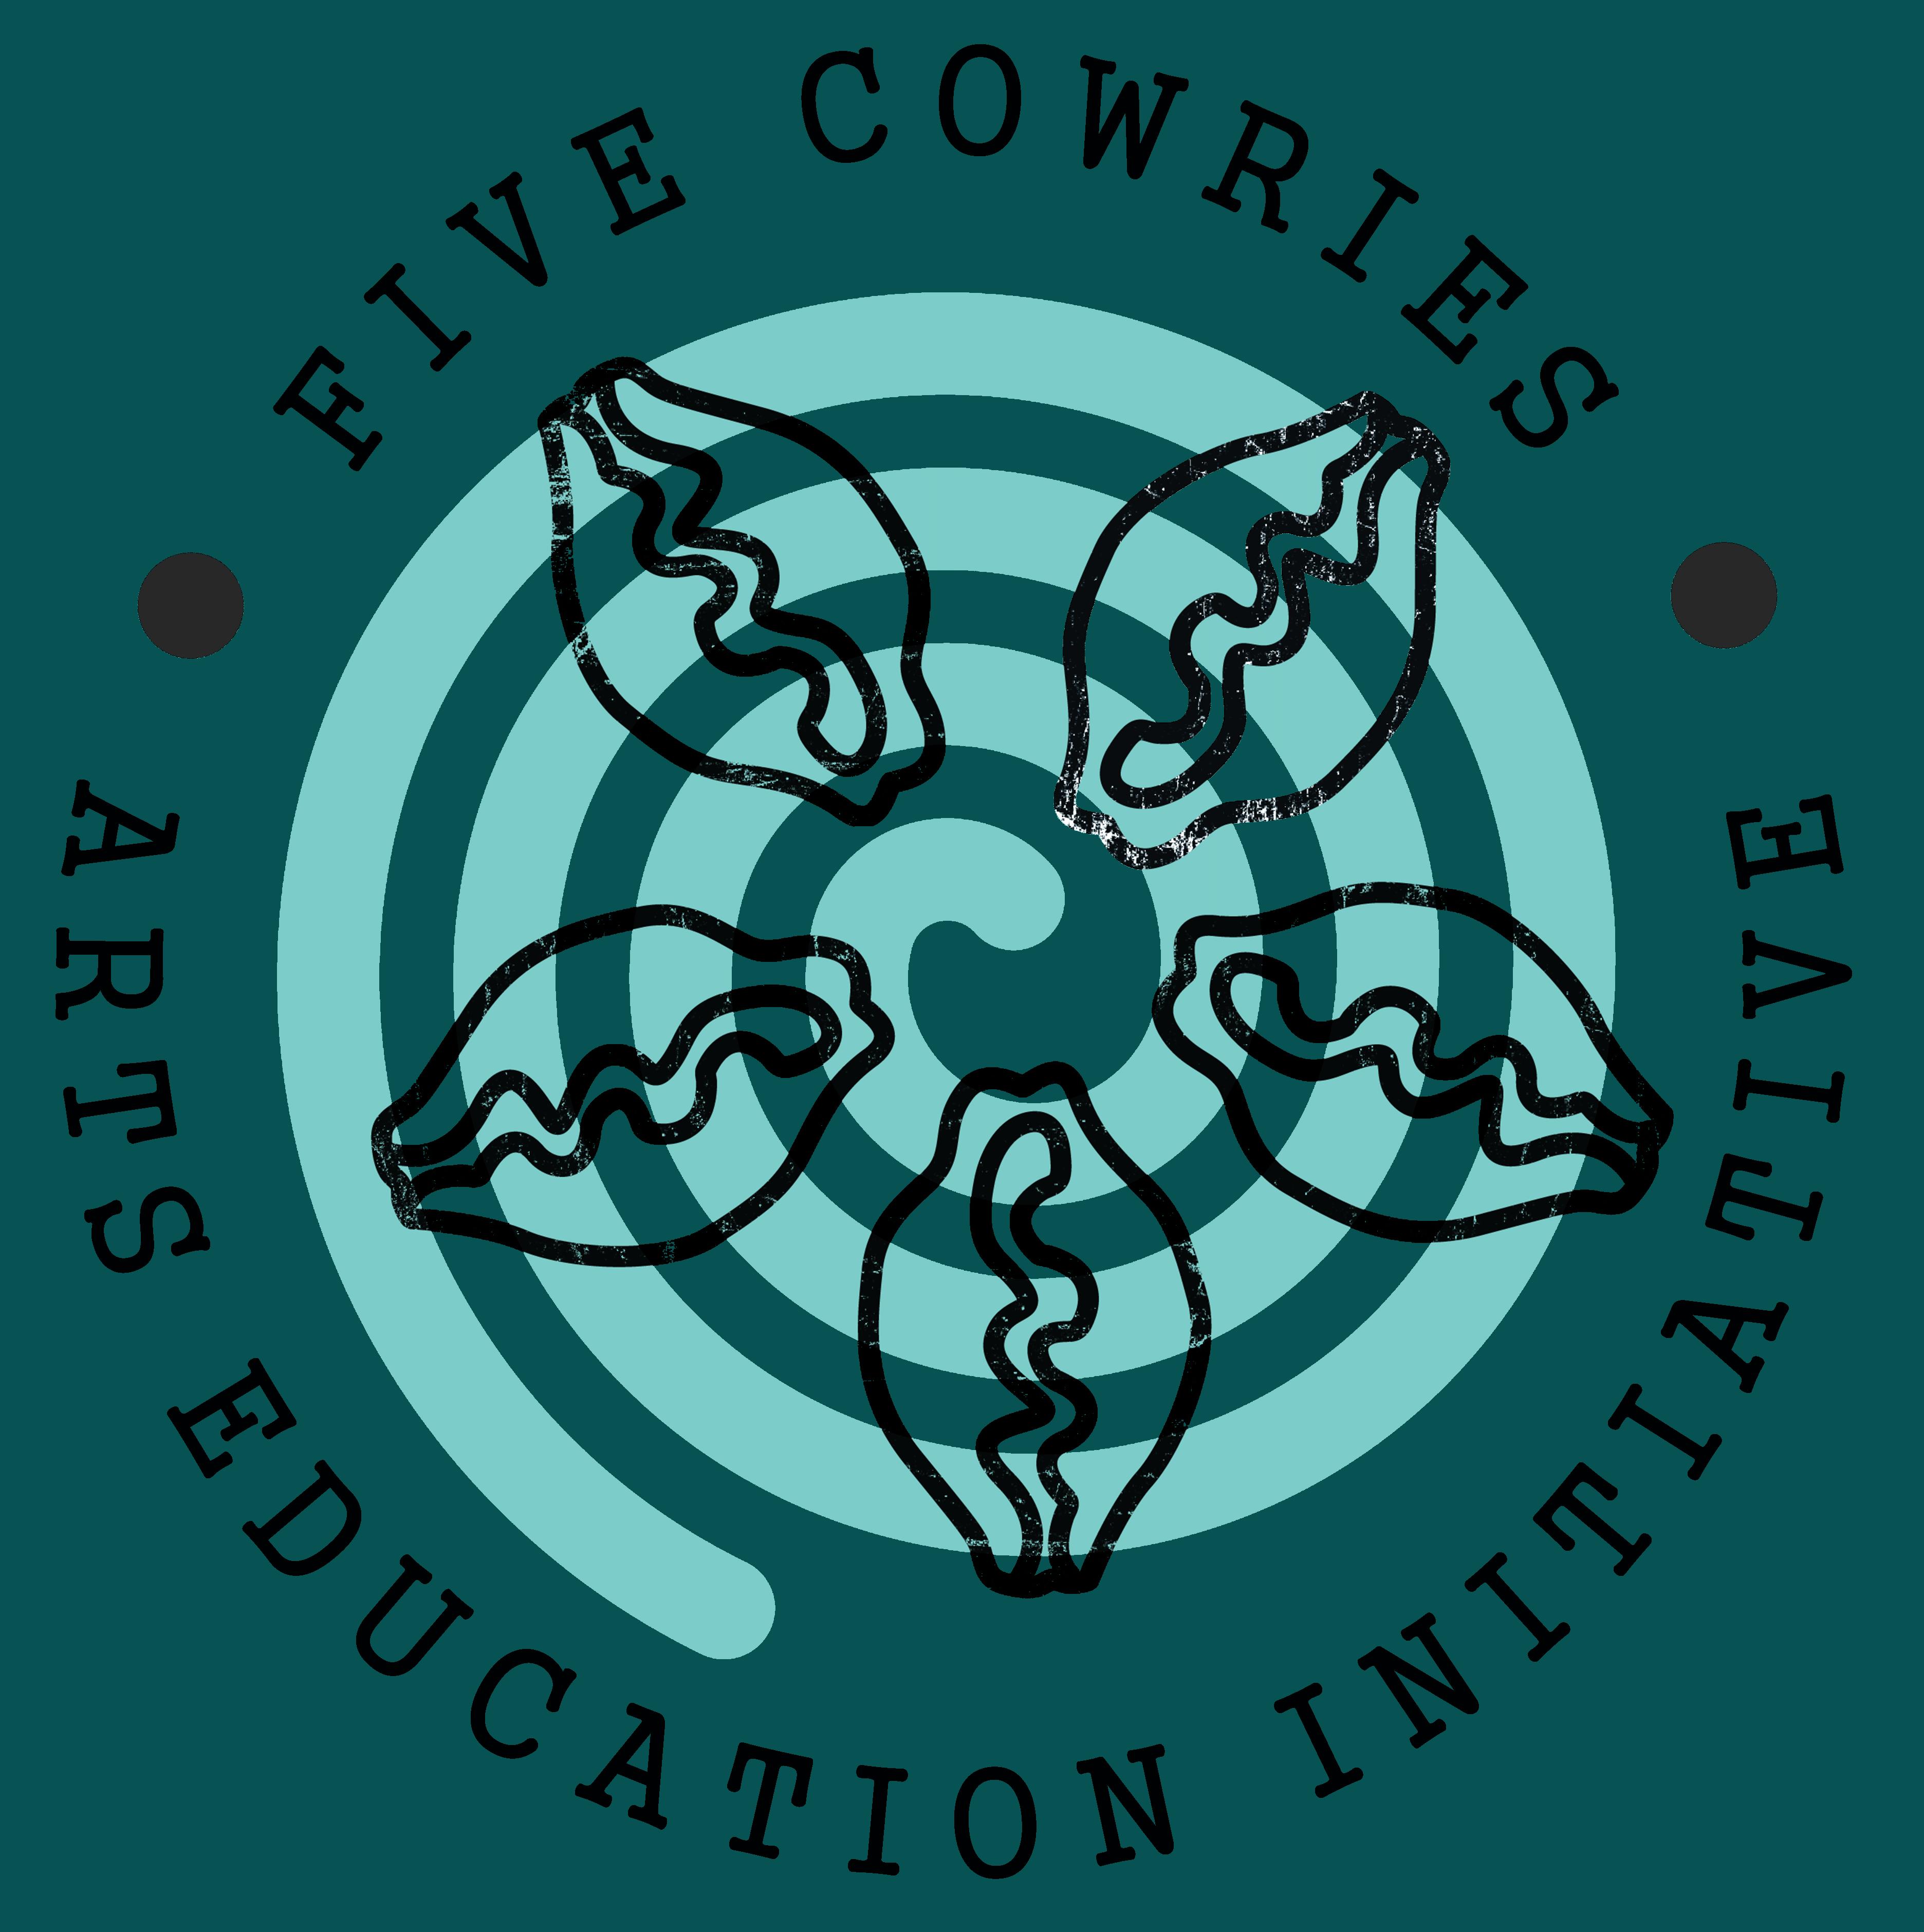 Five Cowries